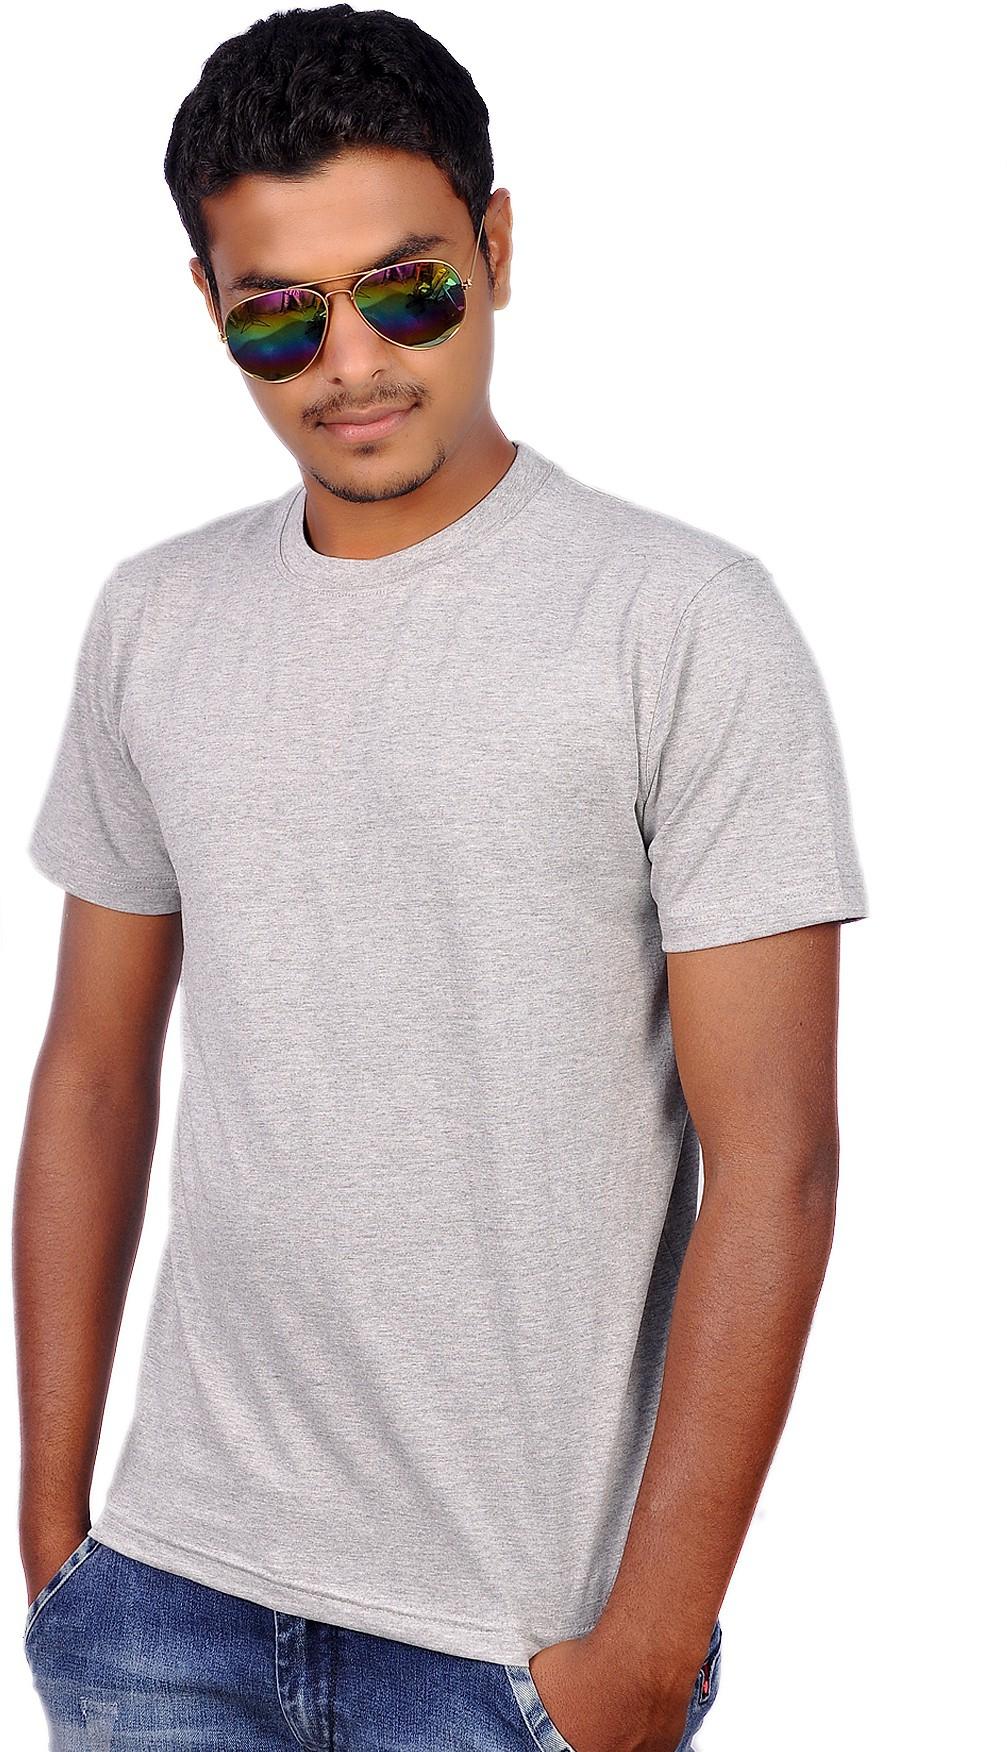 Amla Solid Mens Round Neck Grey T-Shirt